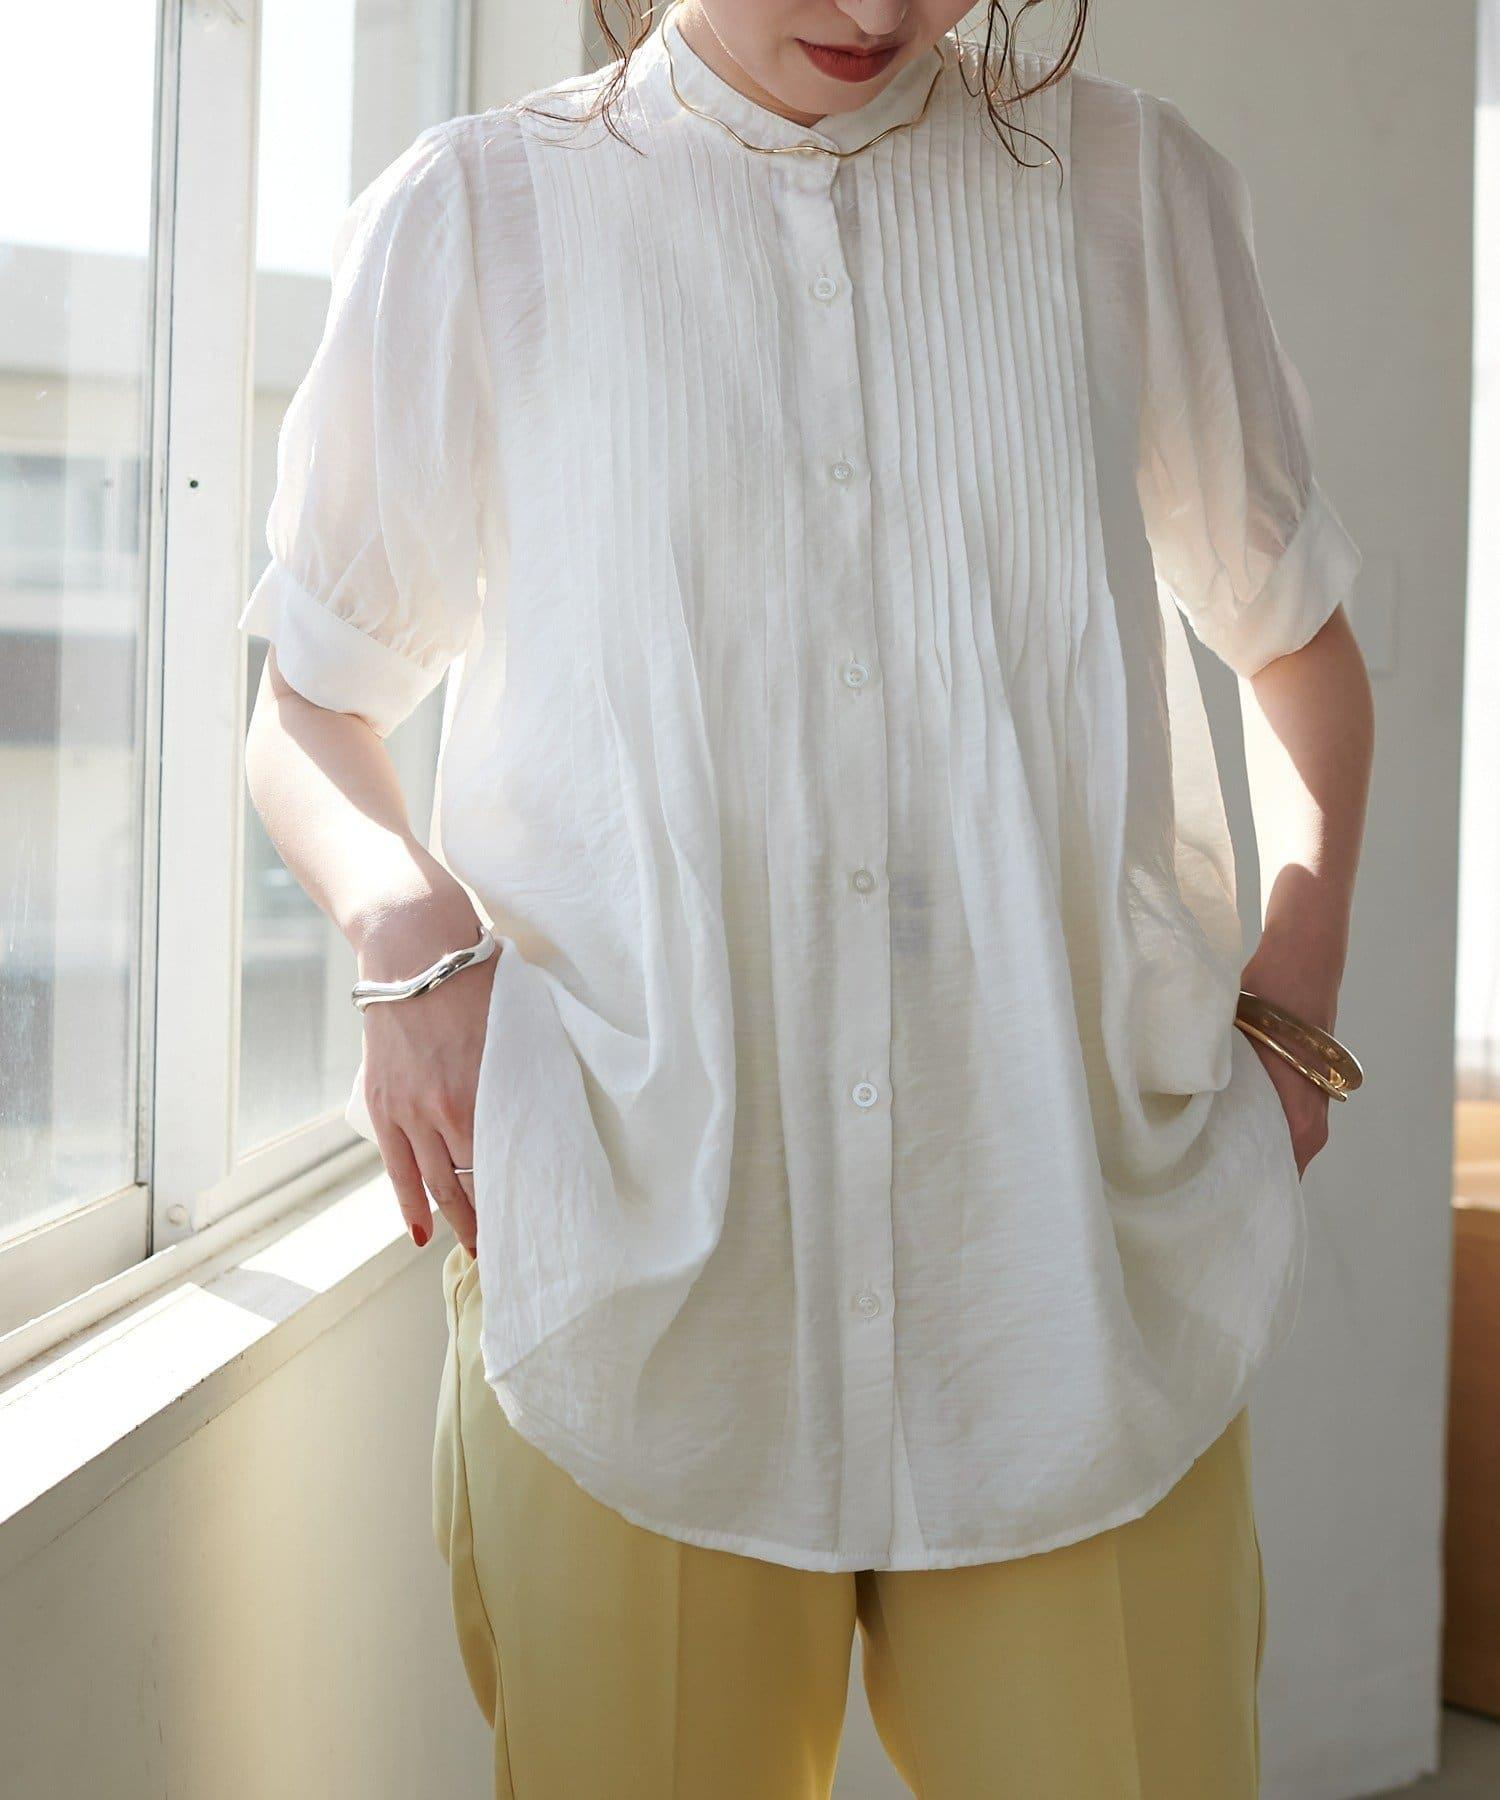 Discoat(ディスコート) 【WEB限定】ピンタック半袖ブラウス≪新色追加!≫